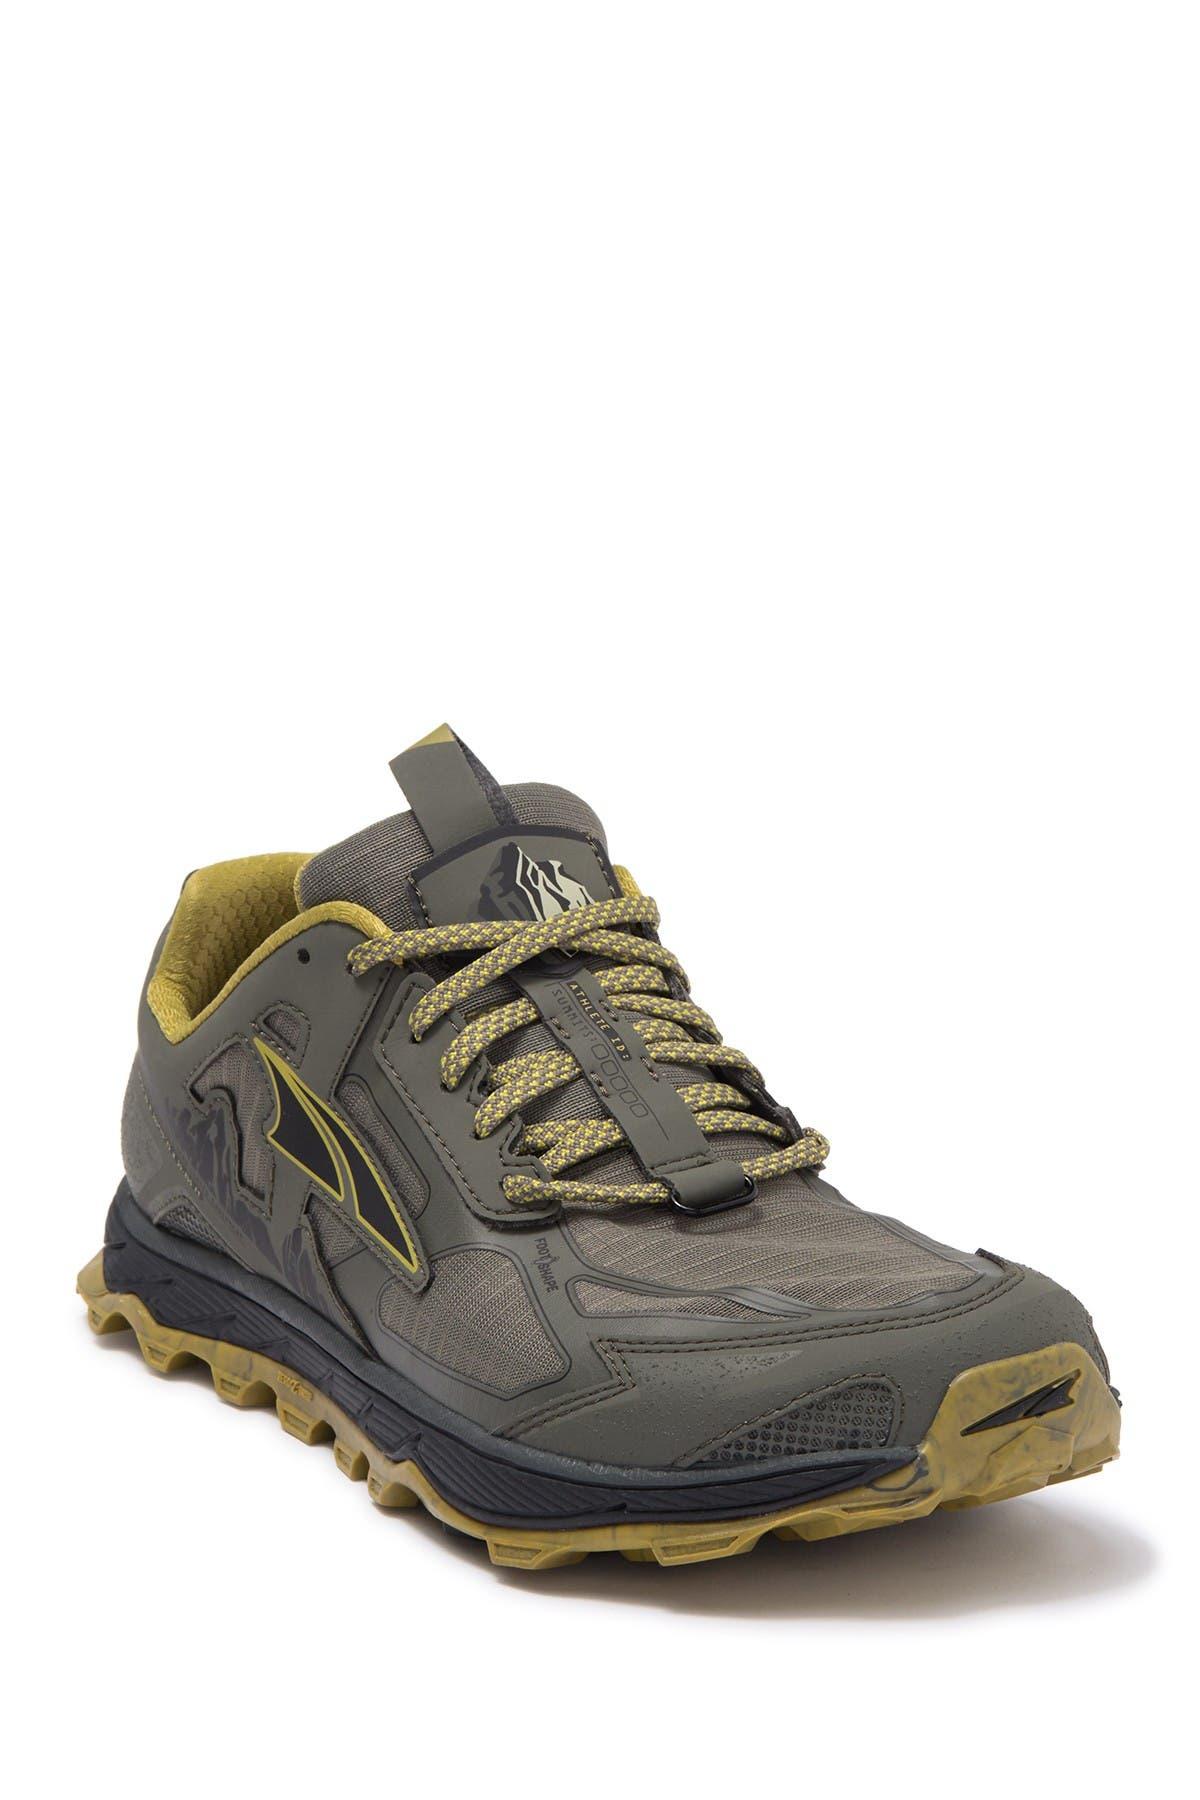 Image of ALTRA Lone Peak 4.5 Trail Sneaker